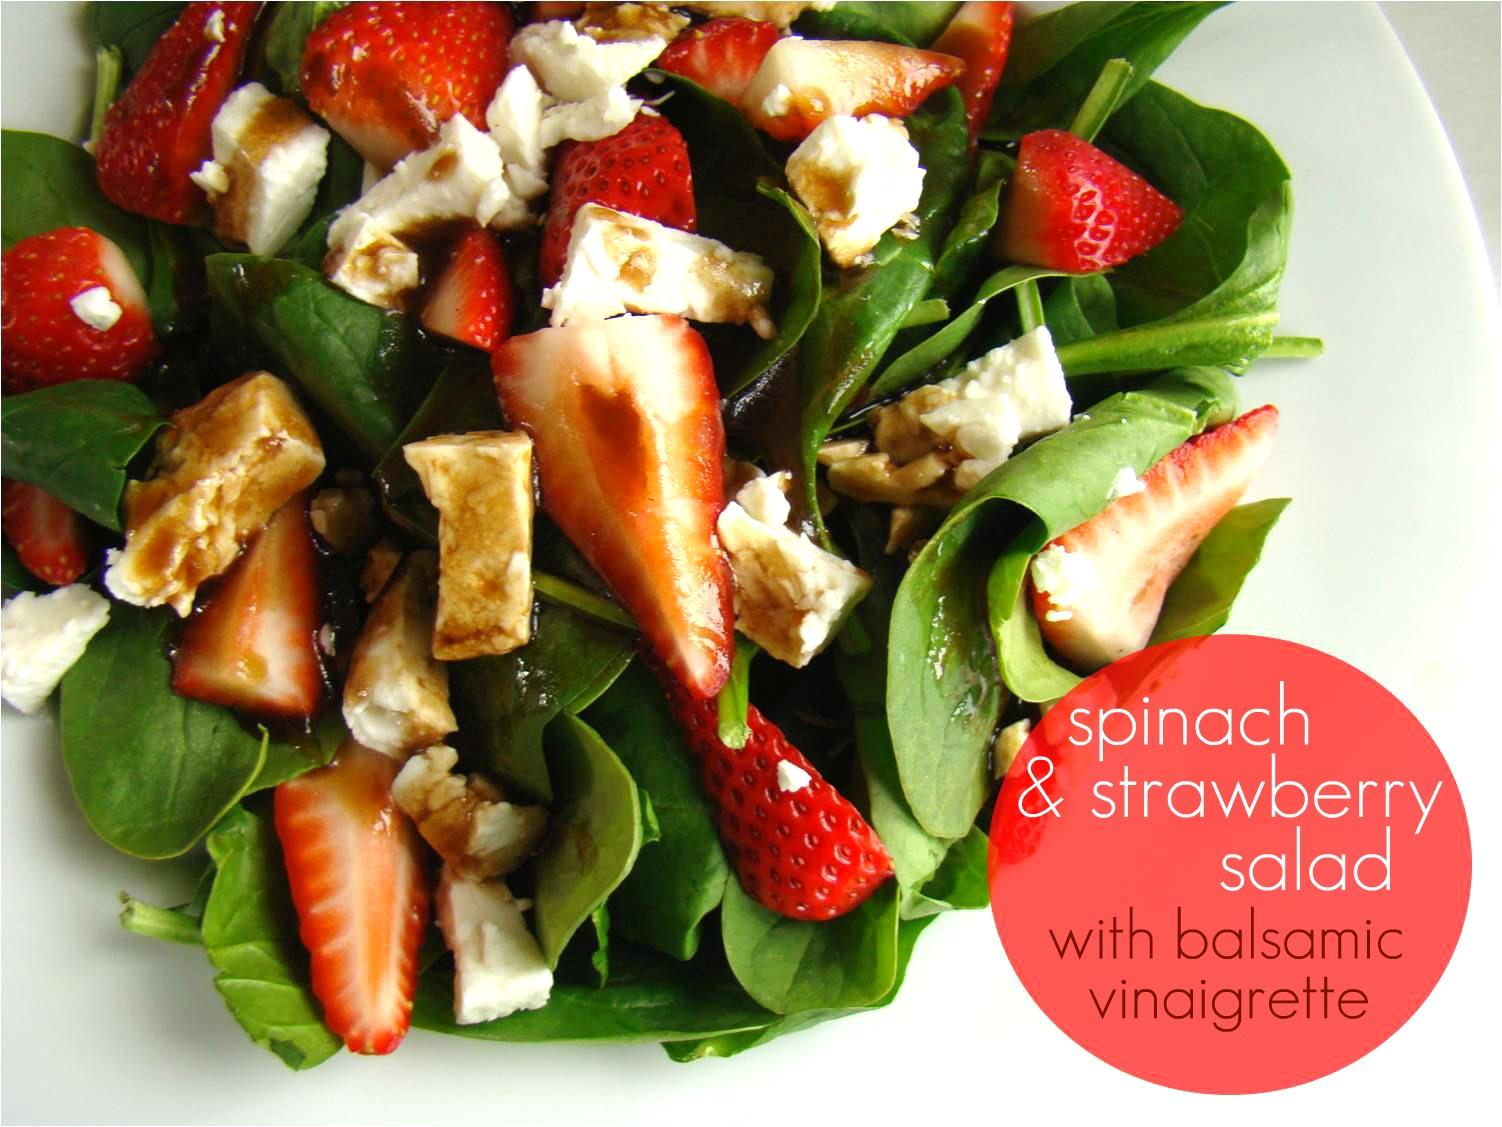 Strawberry Spinach Salad Spinach & strawberry salad